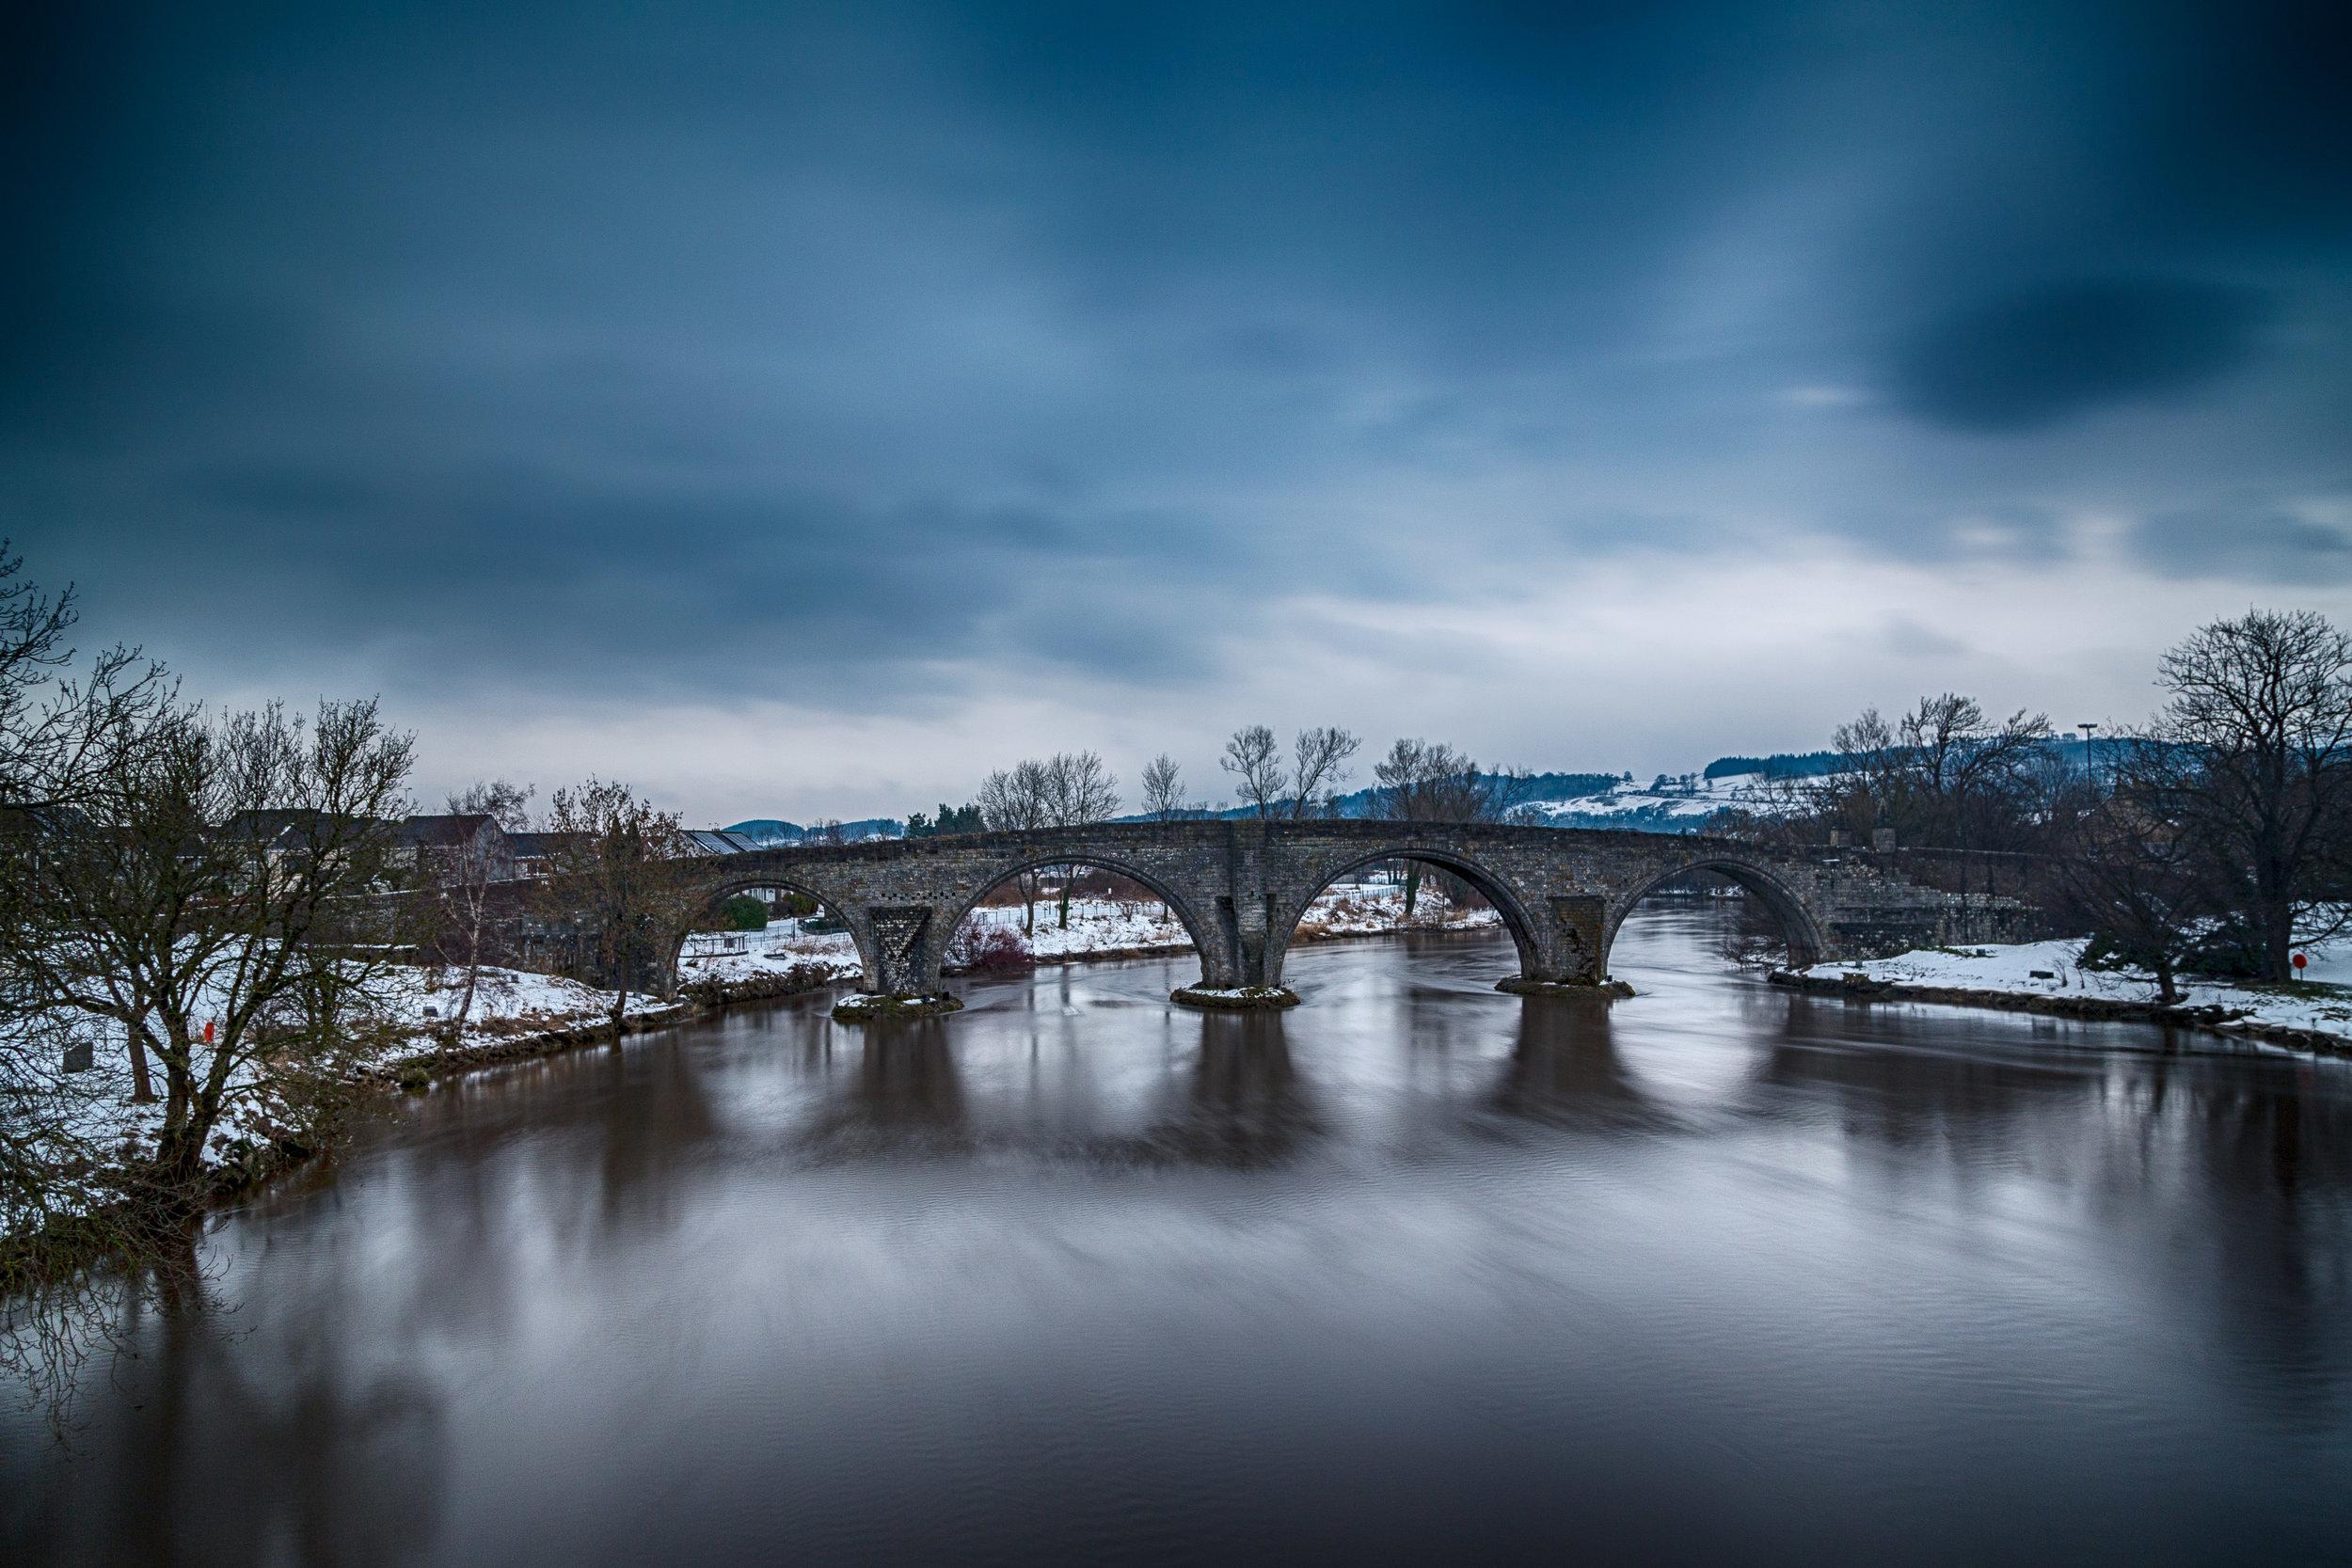 The Old Stirling Bridge